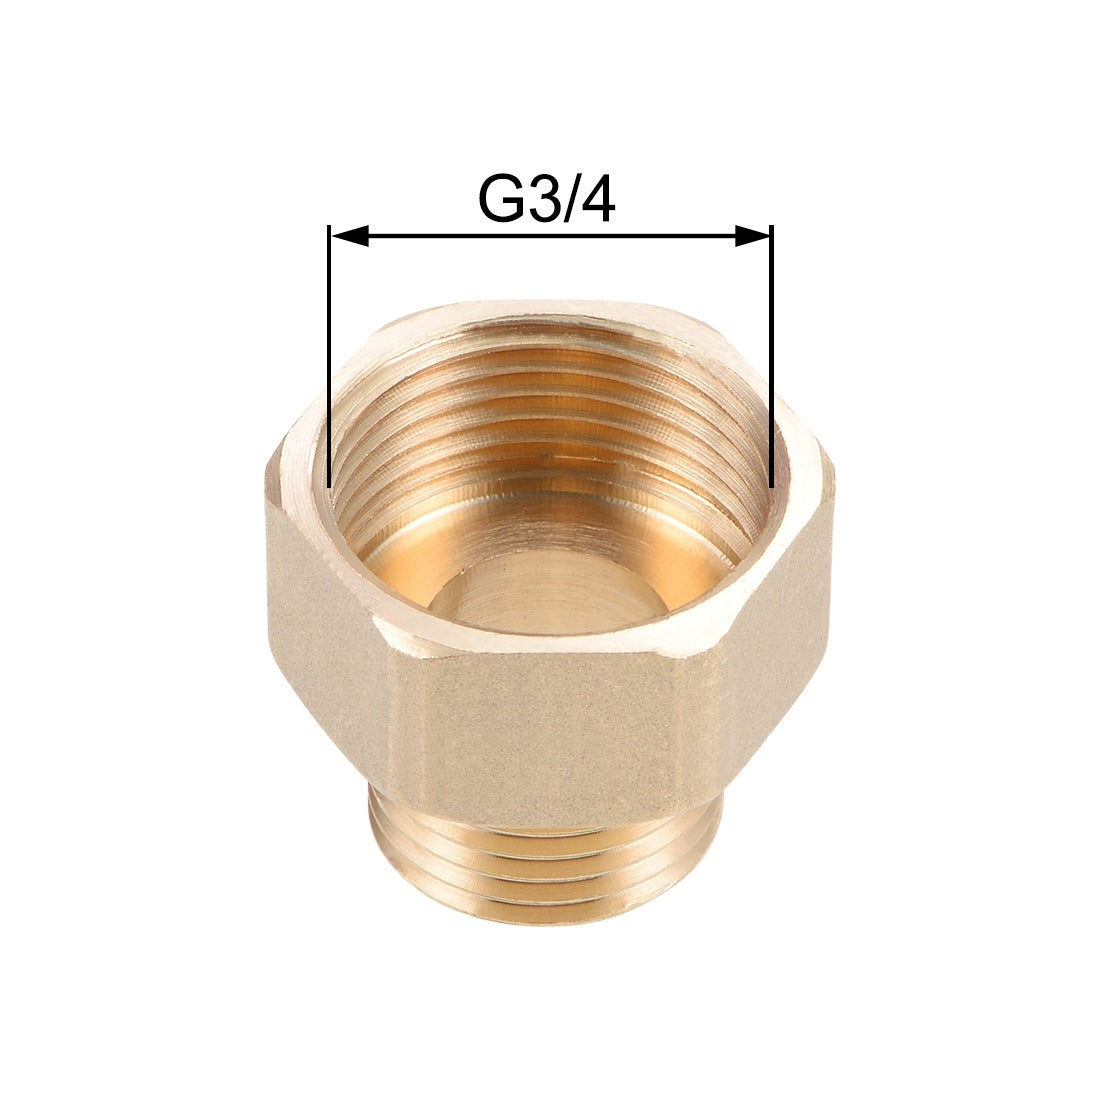 Pipe Fitting G3//4 Male x 1NPT Female Hex Bushing Adapter 36mm Length 2Pcs